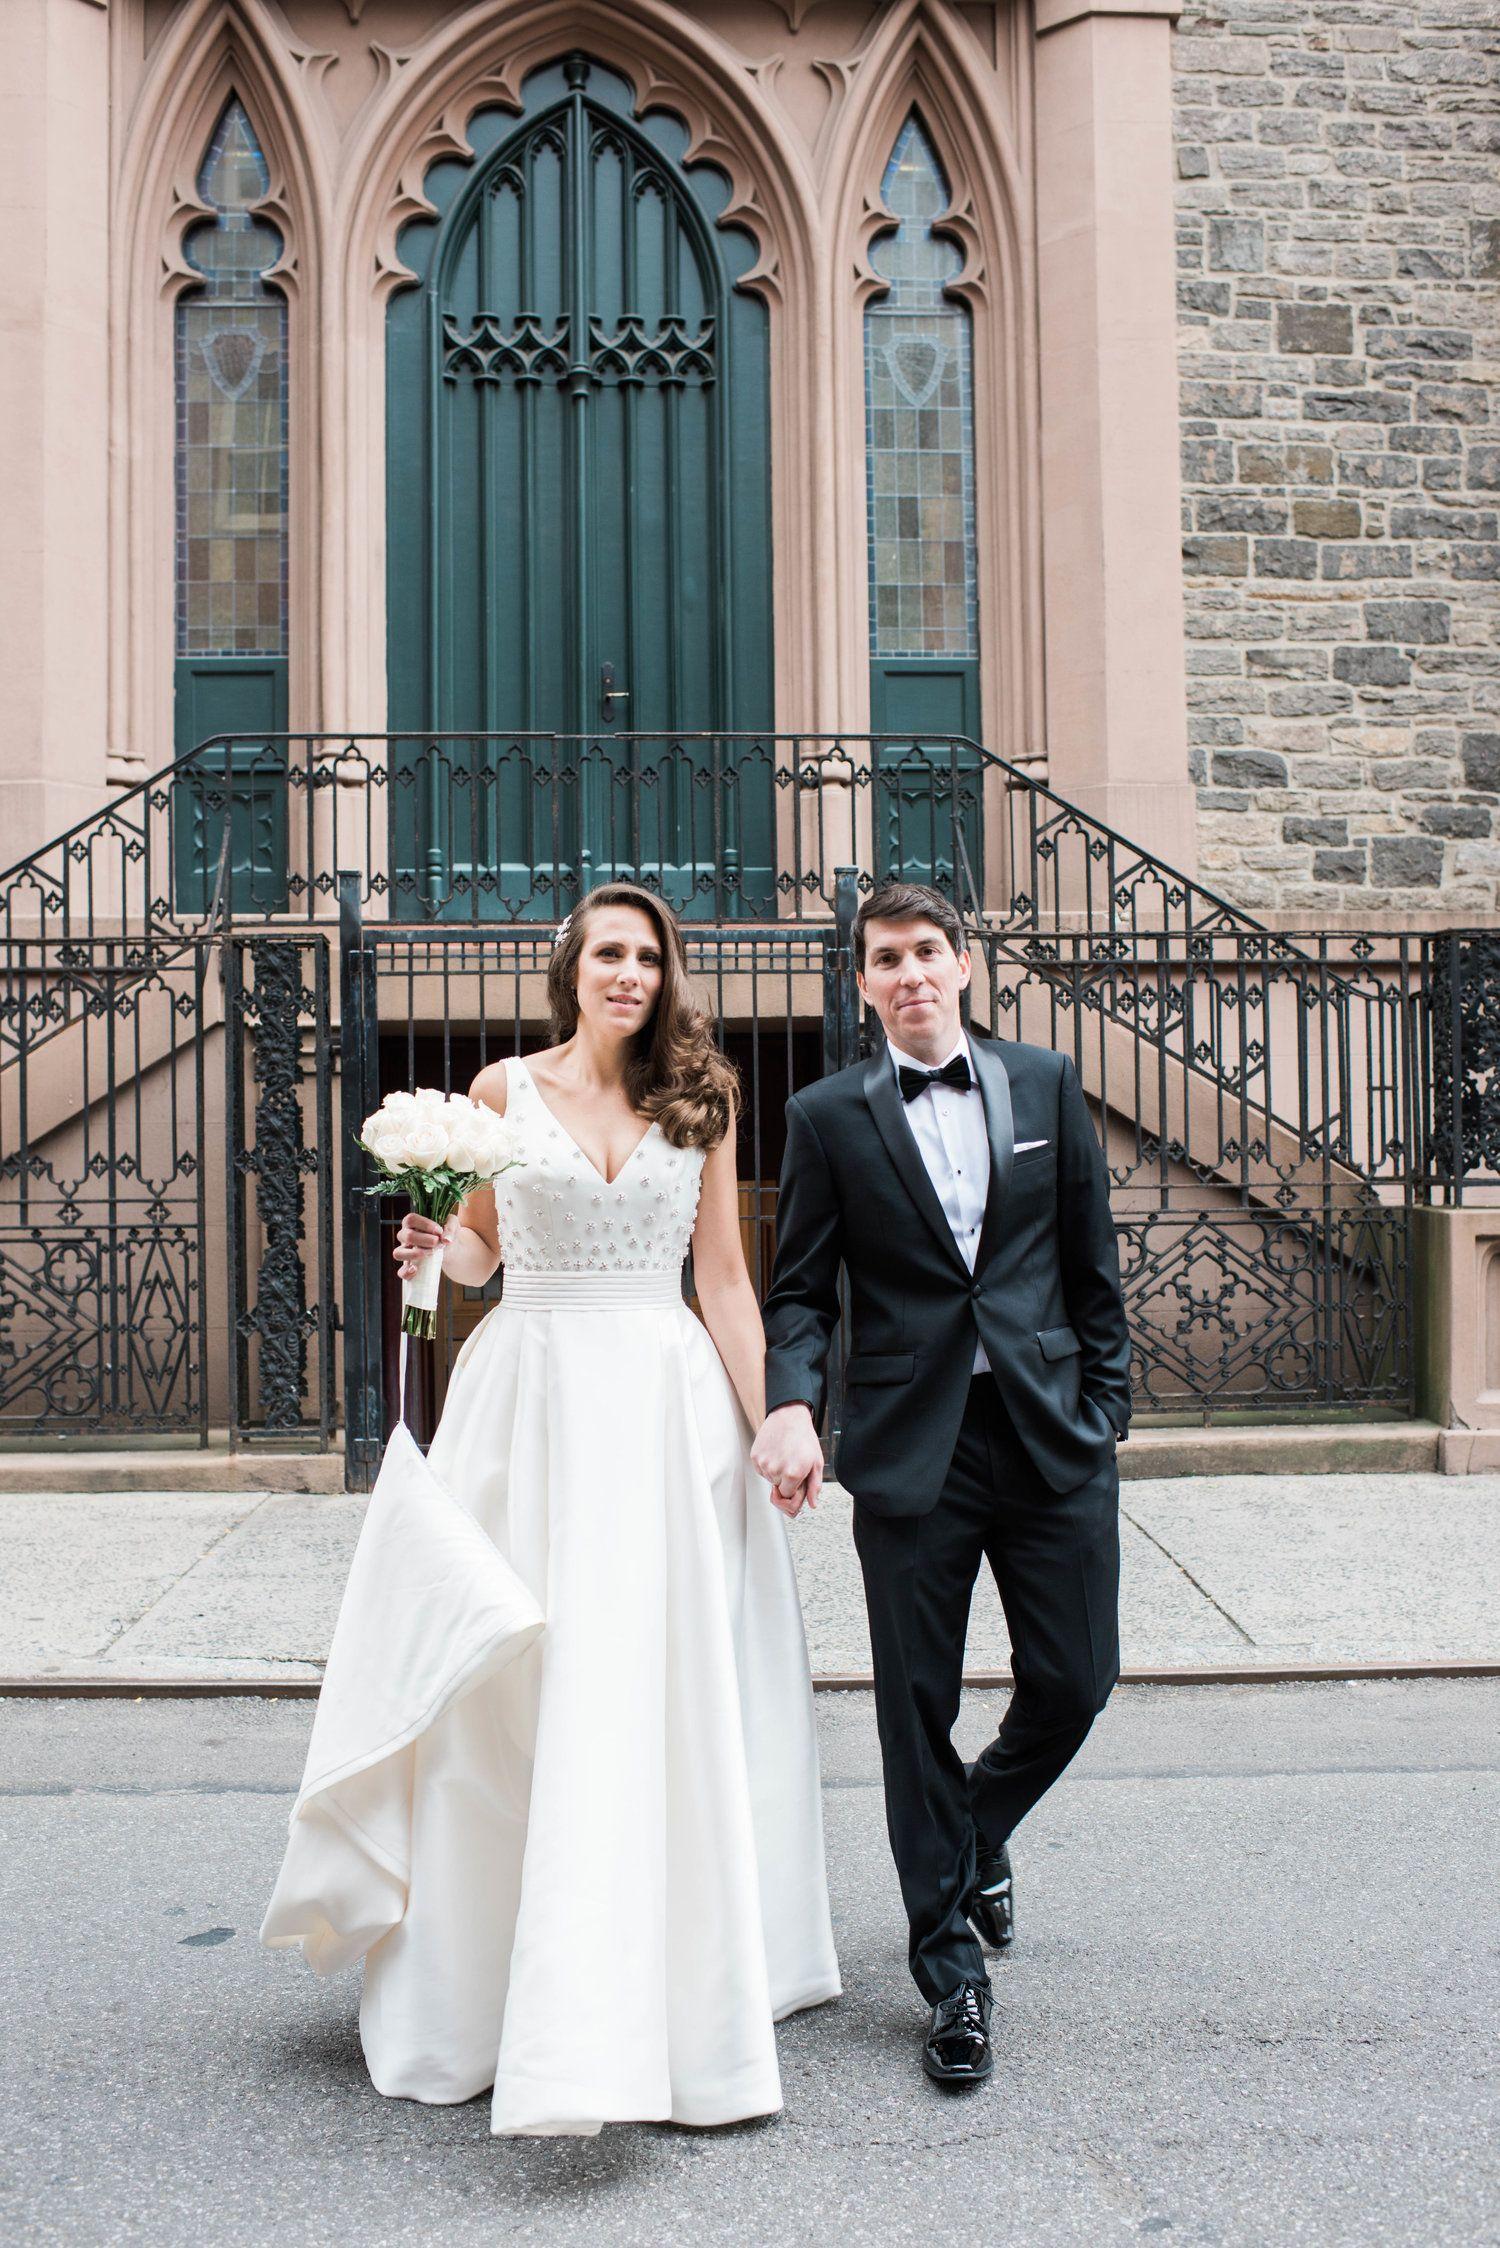 0f86a0aa8364c LIGHT HOUSE BY CHELSEA PIER WEDDING | SOHO WEDDING | SOHO WEDDING PHOTOS |  The Basilica